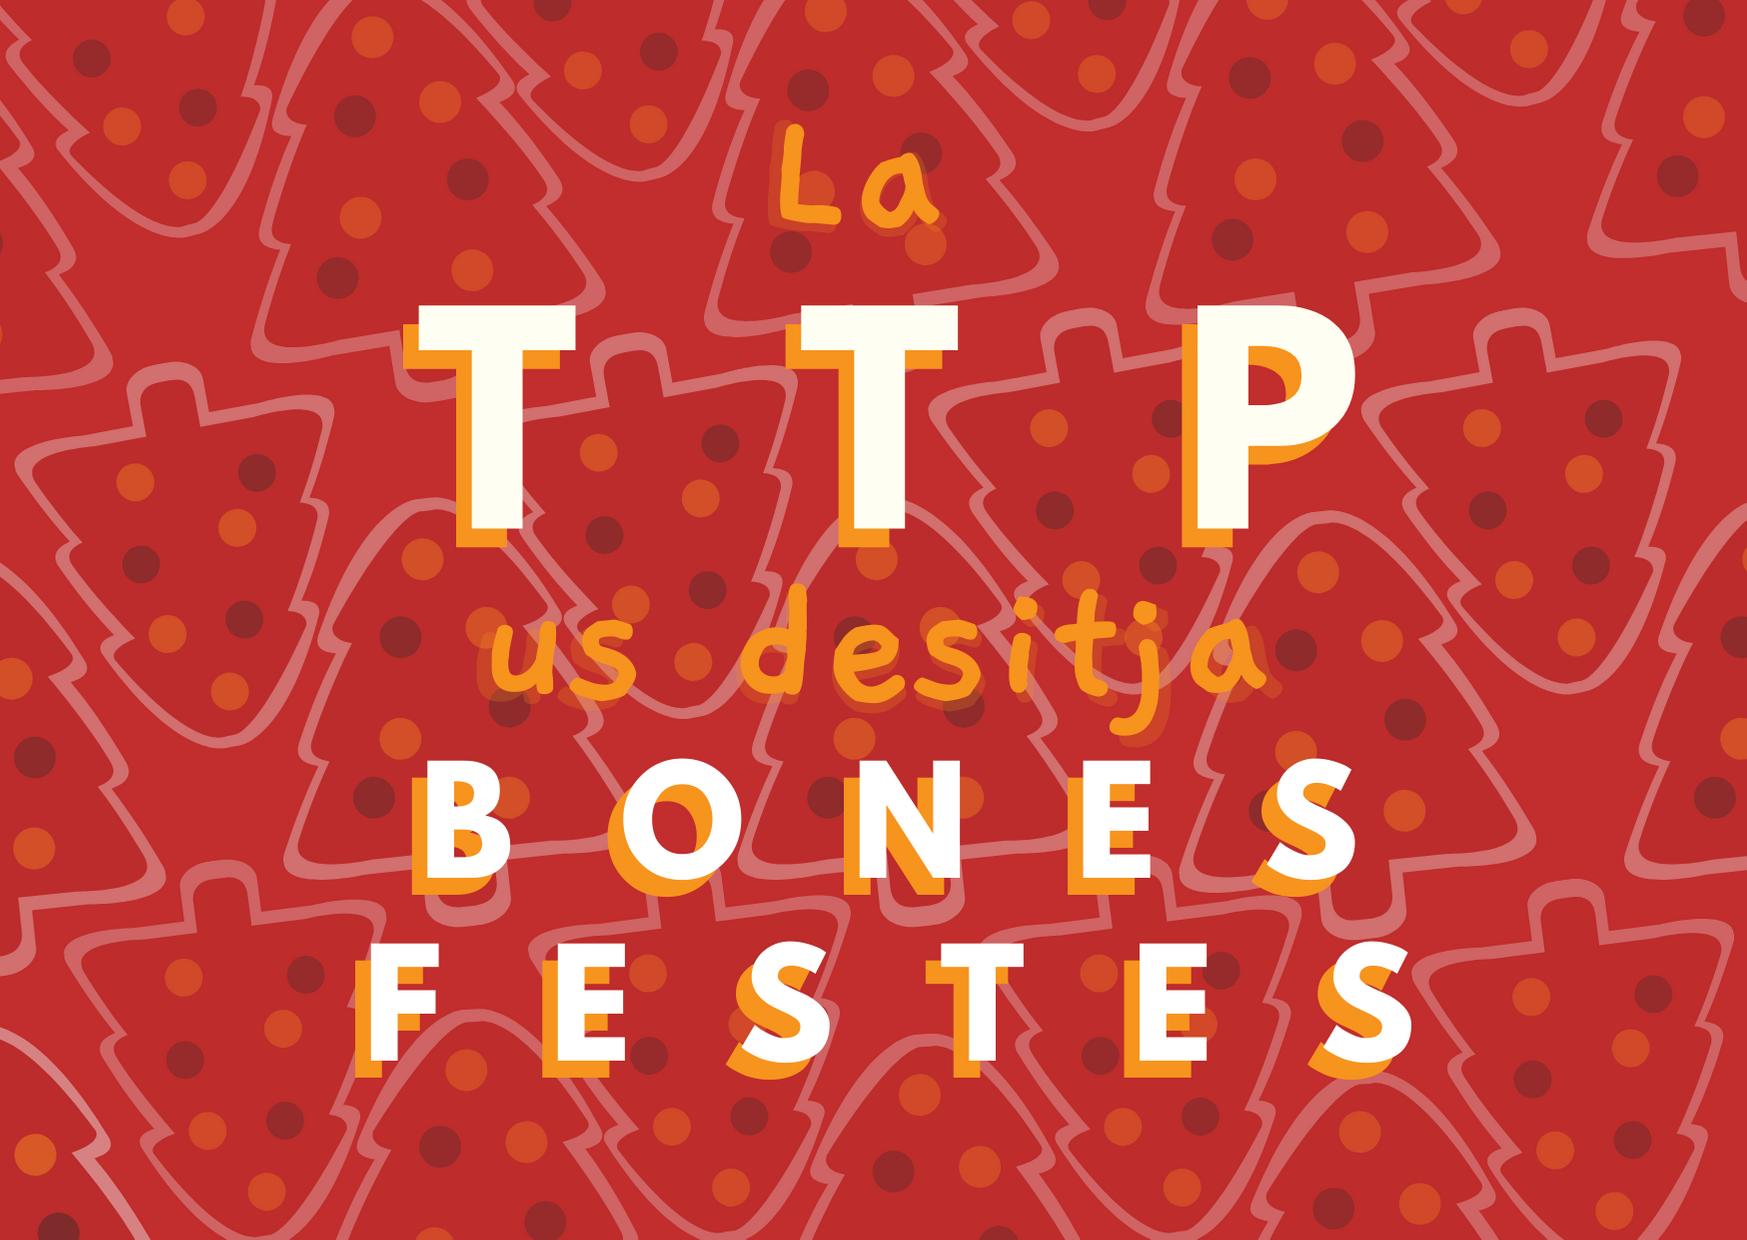 Bones festes família TTPera